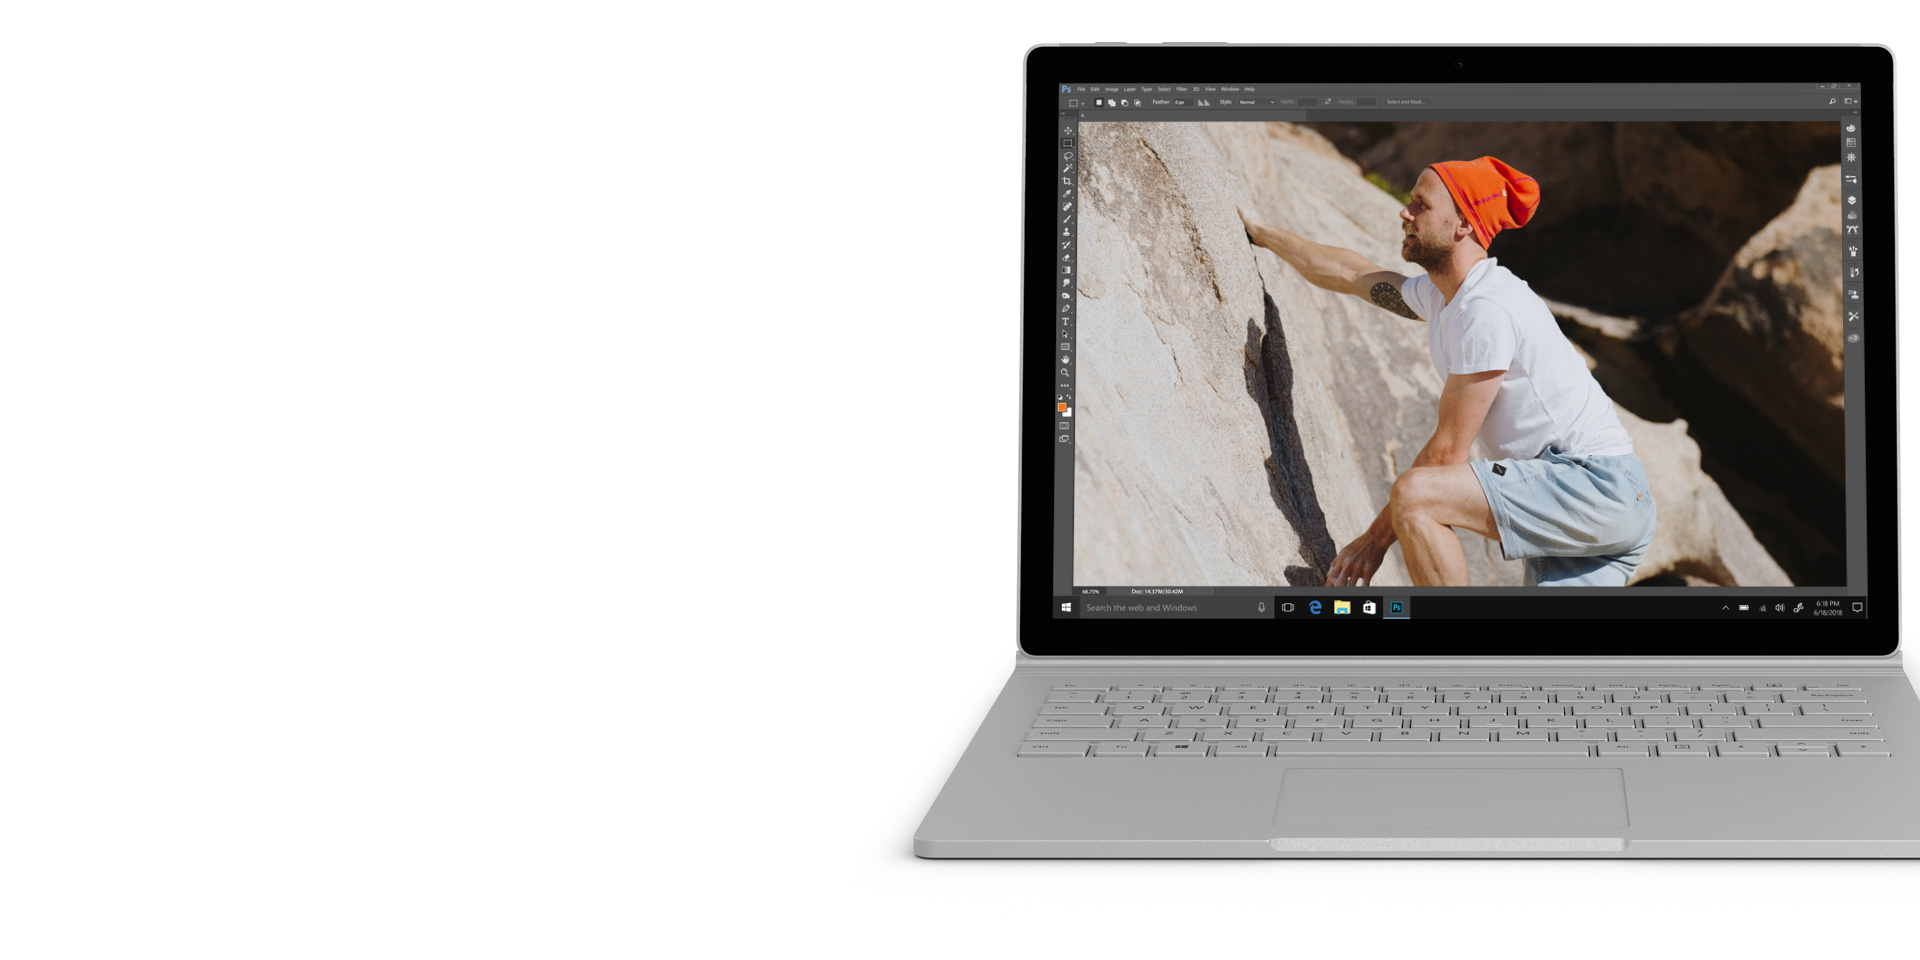 Paparan Adobe Photoshop pada Surface Book 2